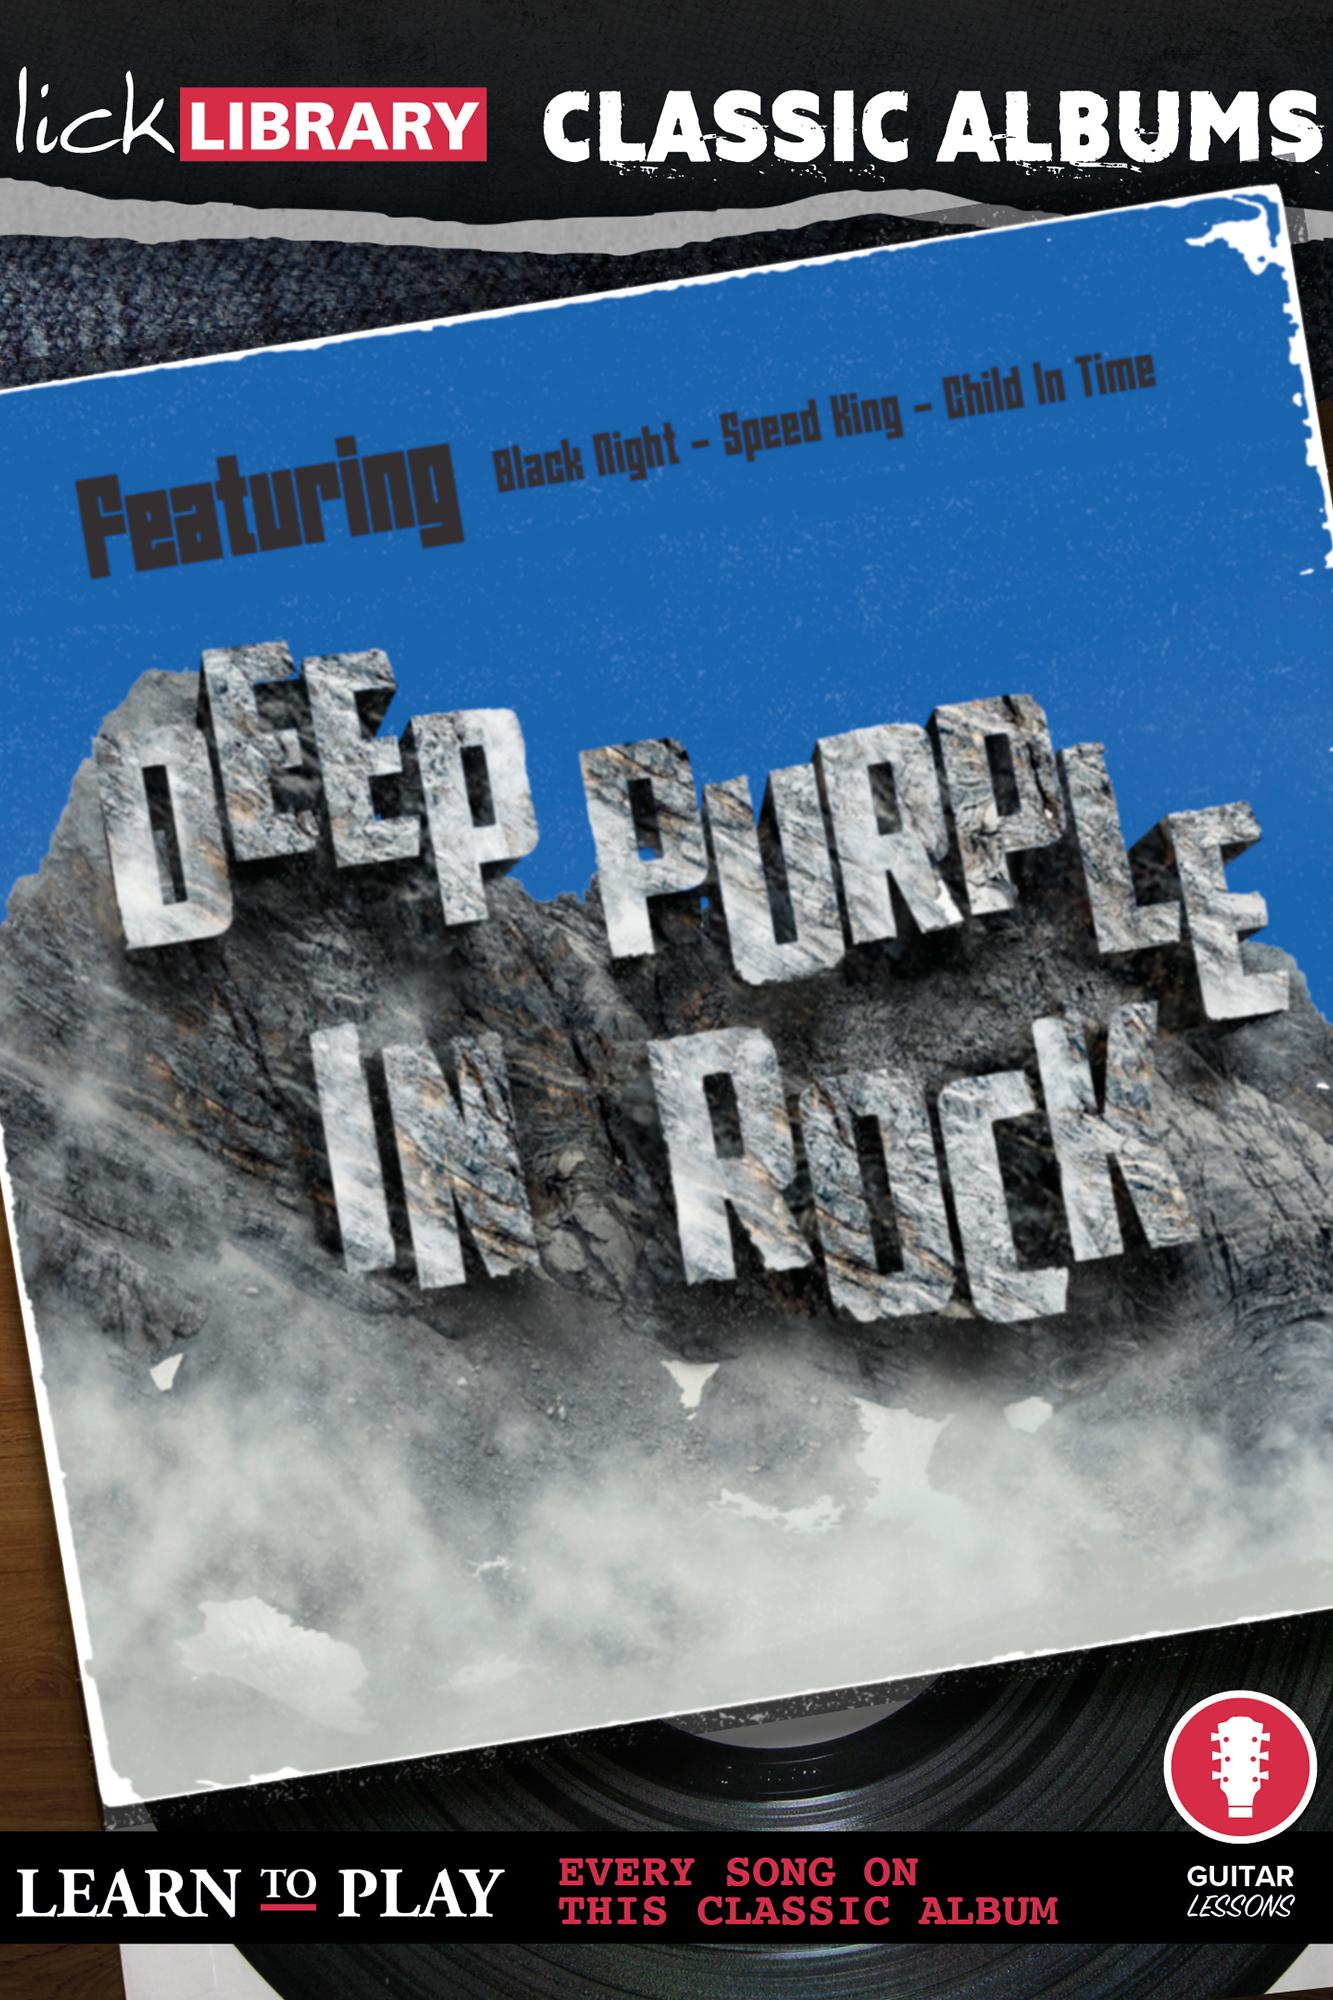 Classic Albums Deep Purple In Rock